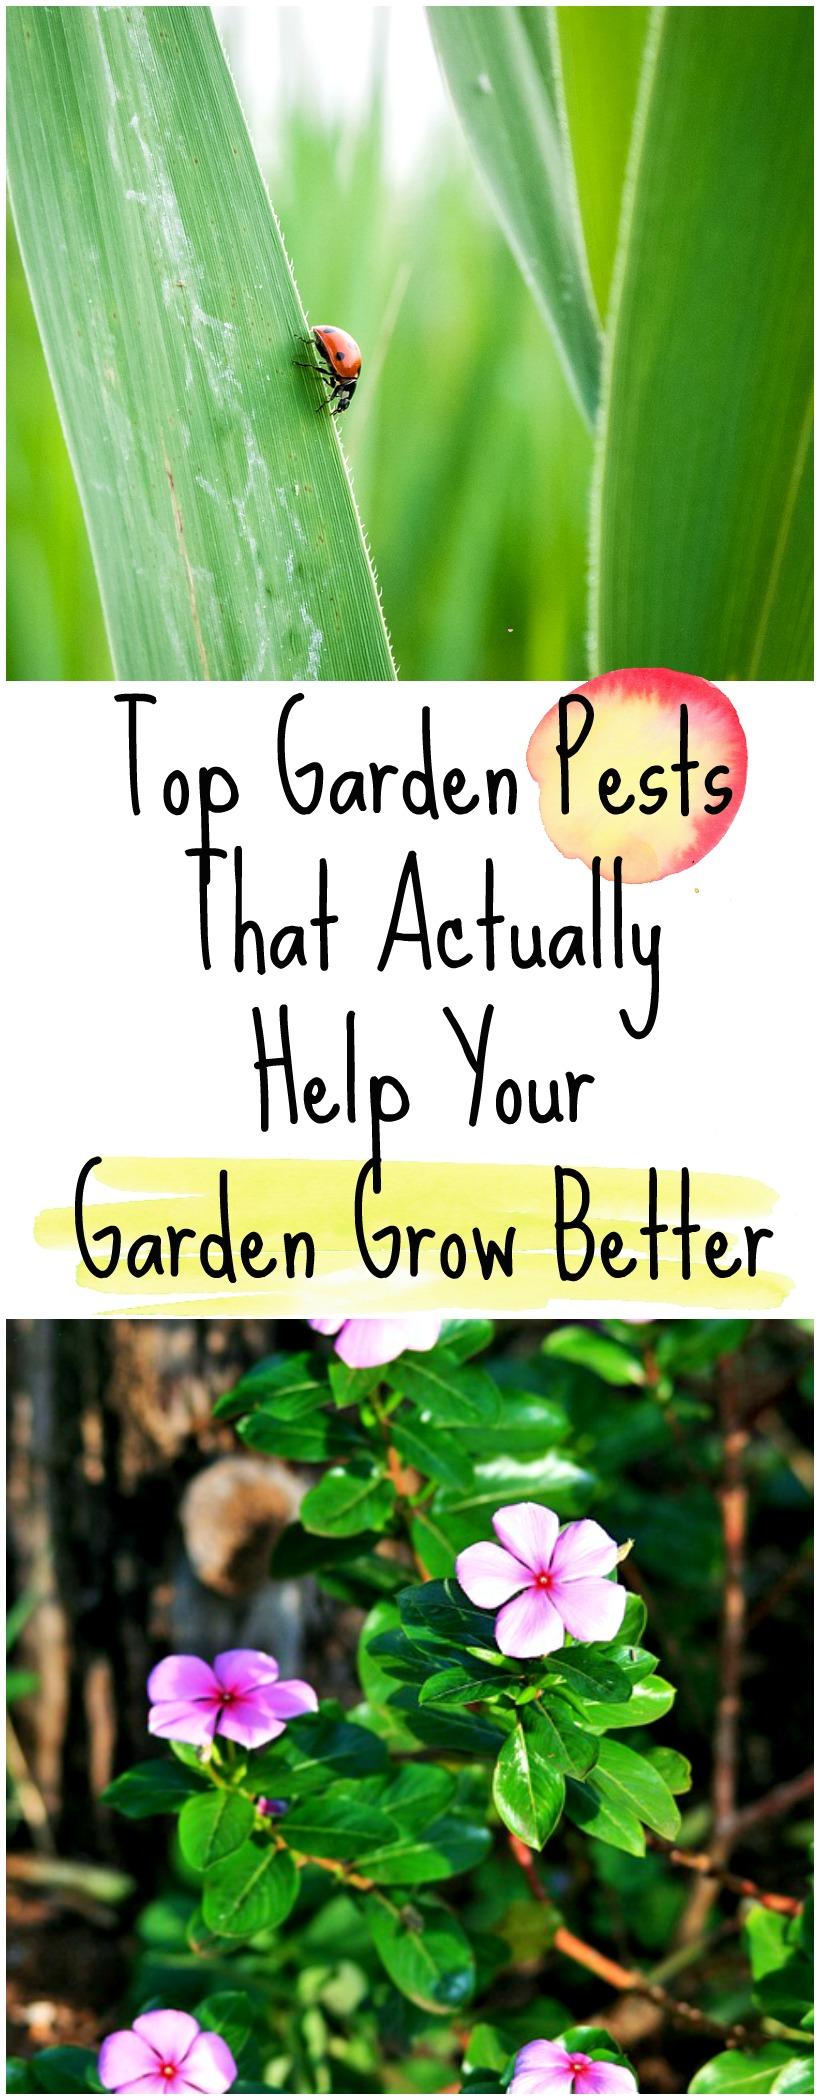 Top Garden Pests That Actually Help Your Garden Grow Better